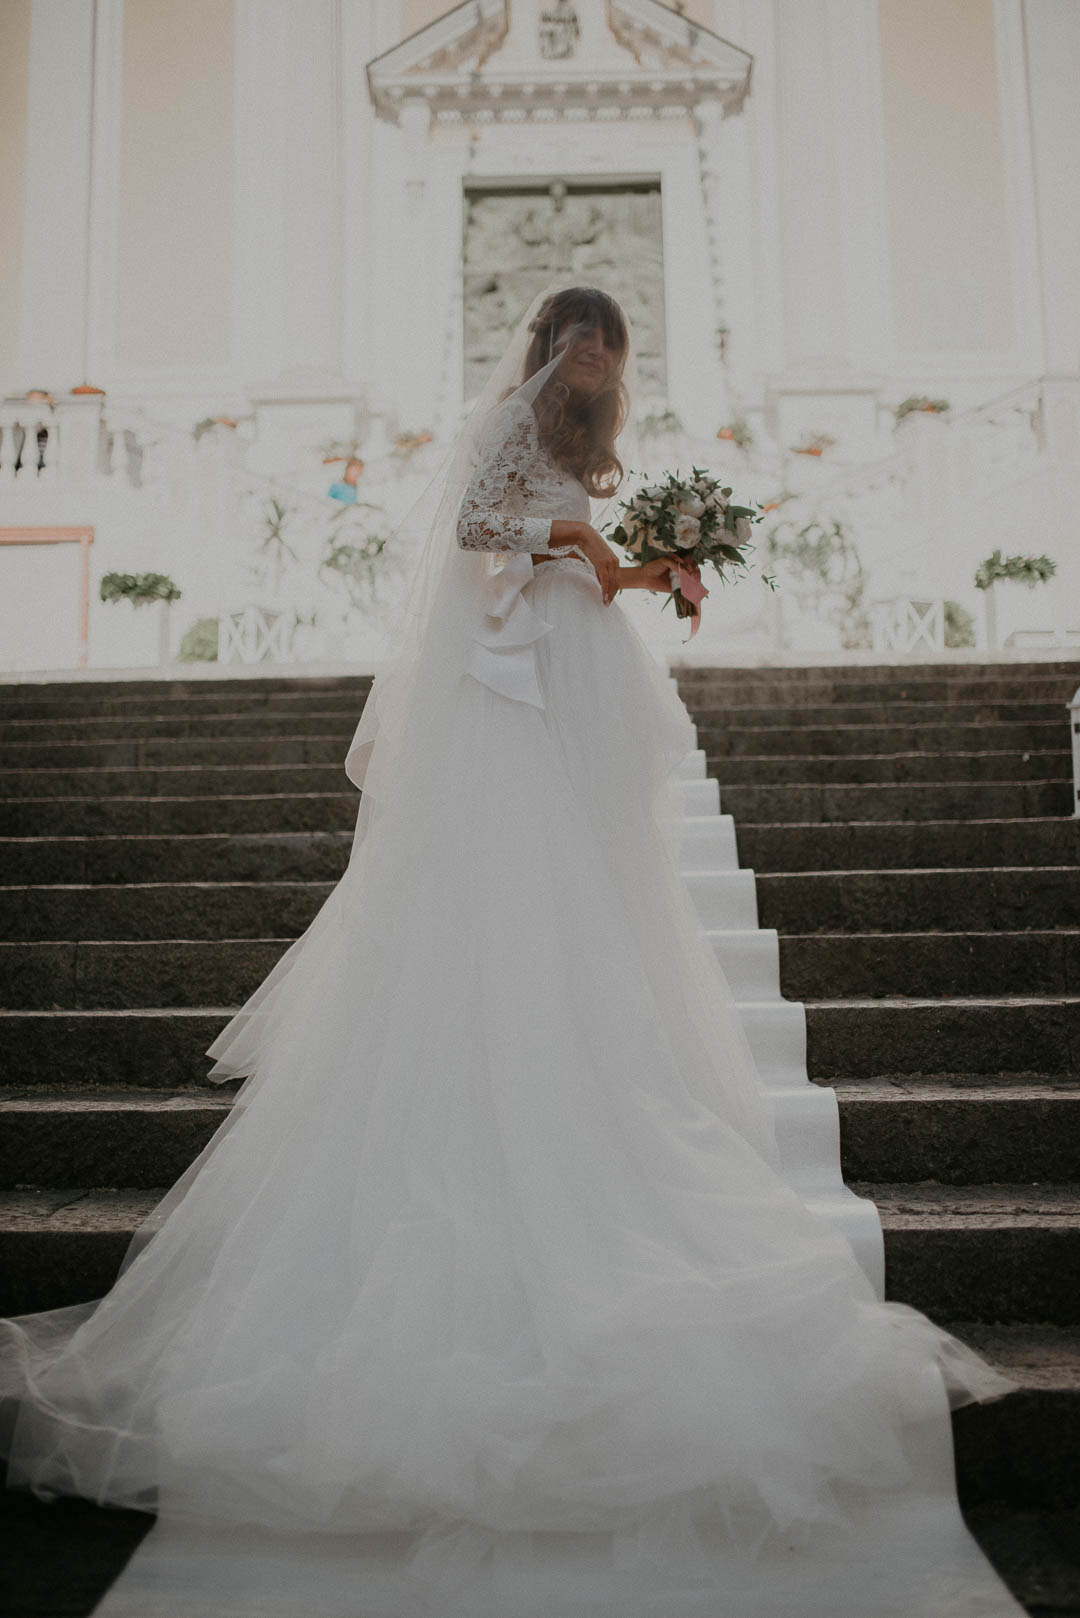 wedding-photographer-destination-fineart-bespoke-reportage-napoli-nabilah-vivianeizzo-spazio46-56